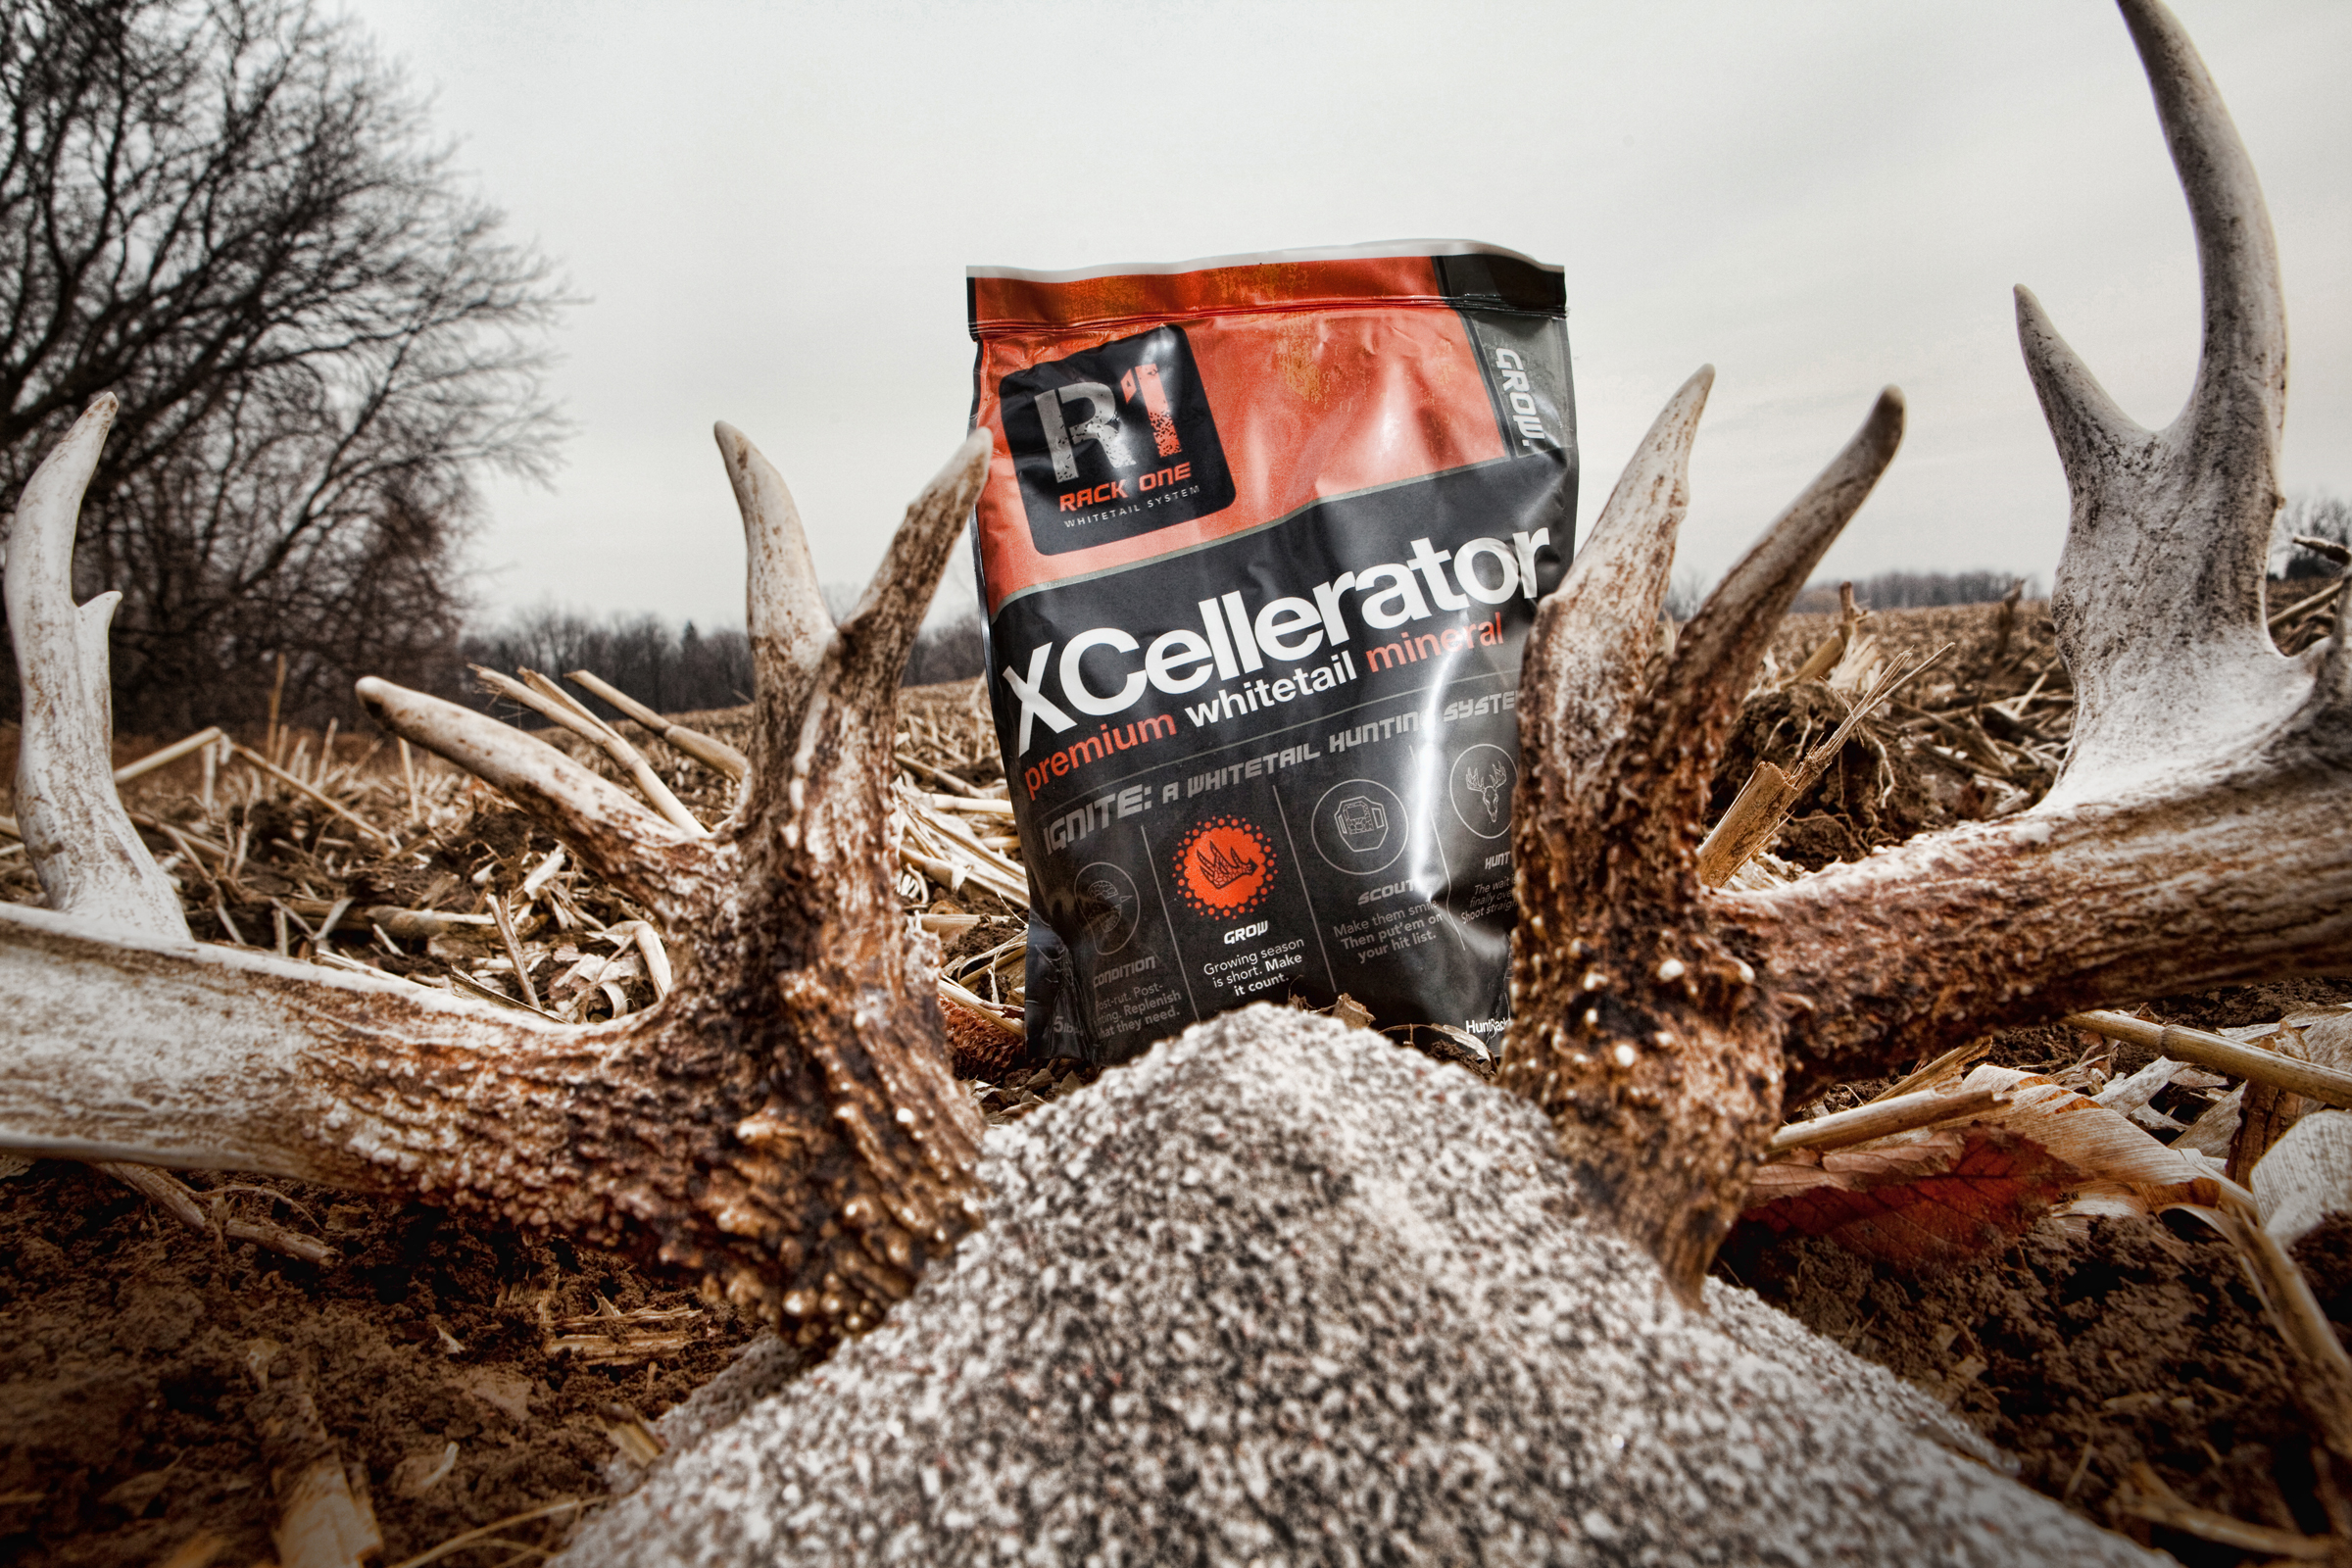 Xcellerator Premium Mineral Supplement